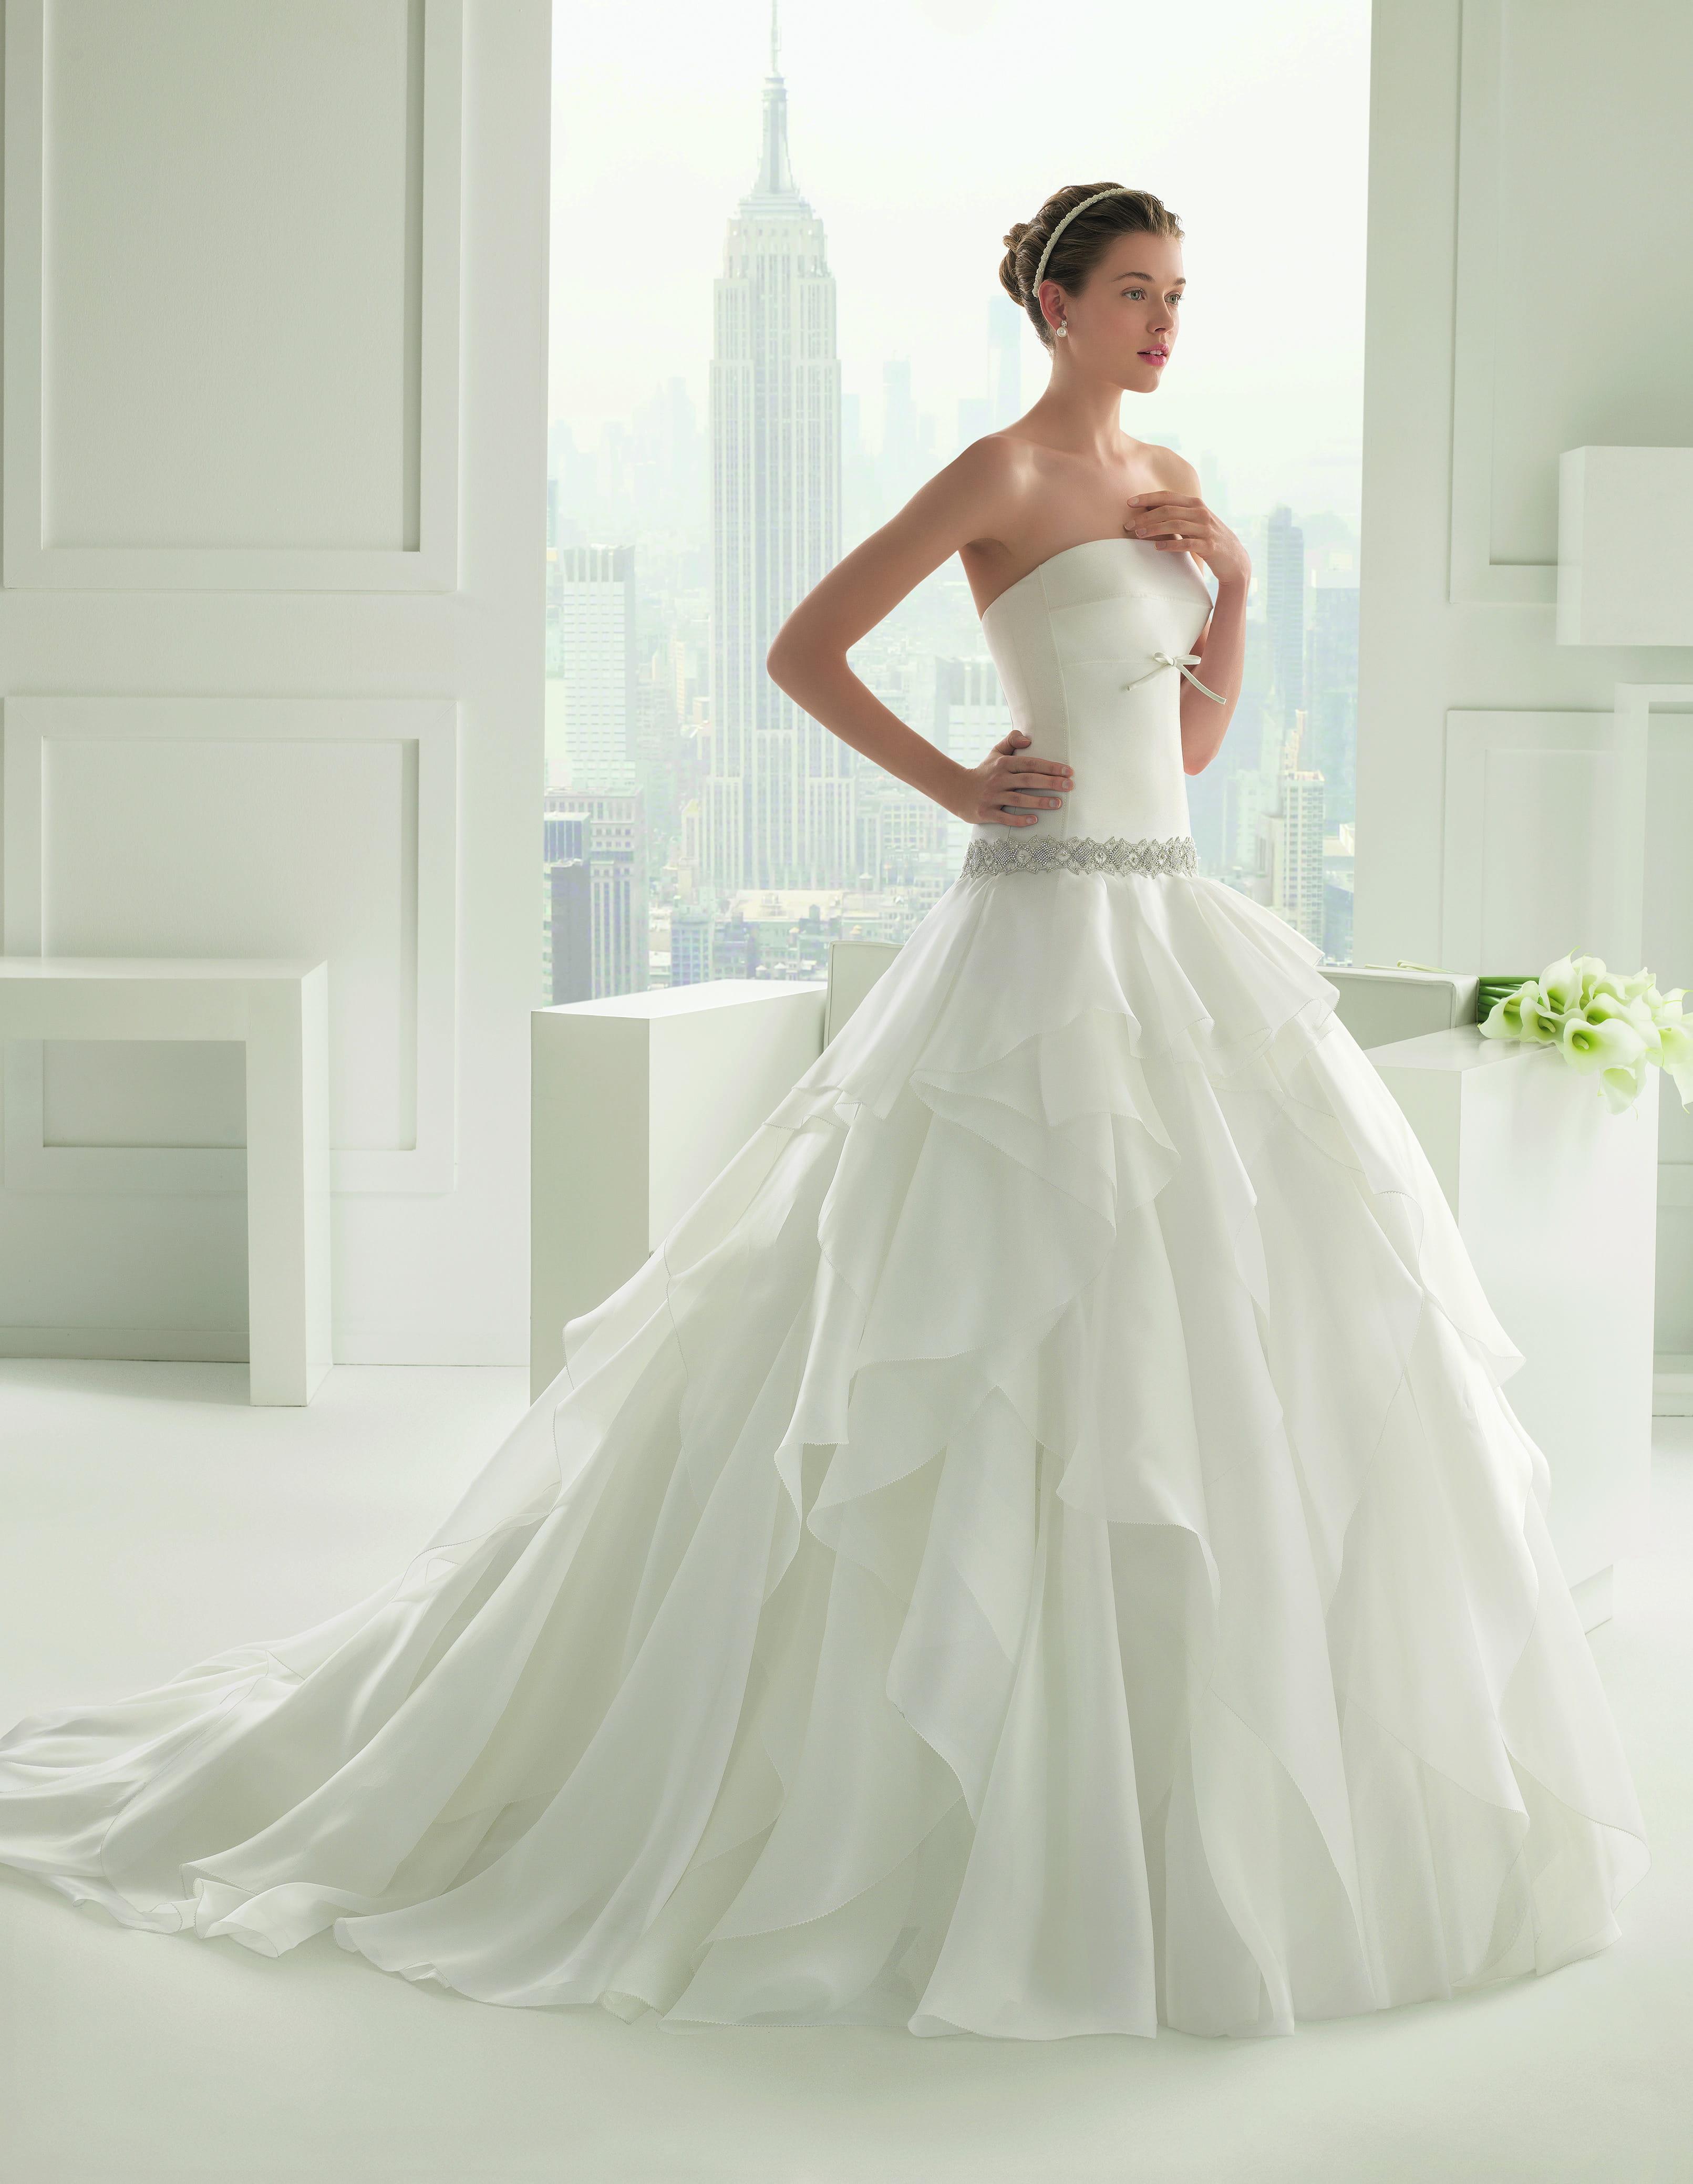 Choisir une gandoura moderne ou haute couture pas cher?